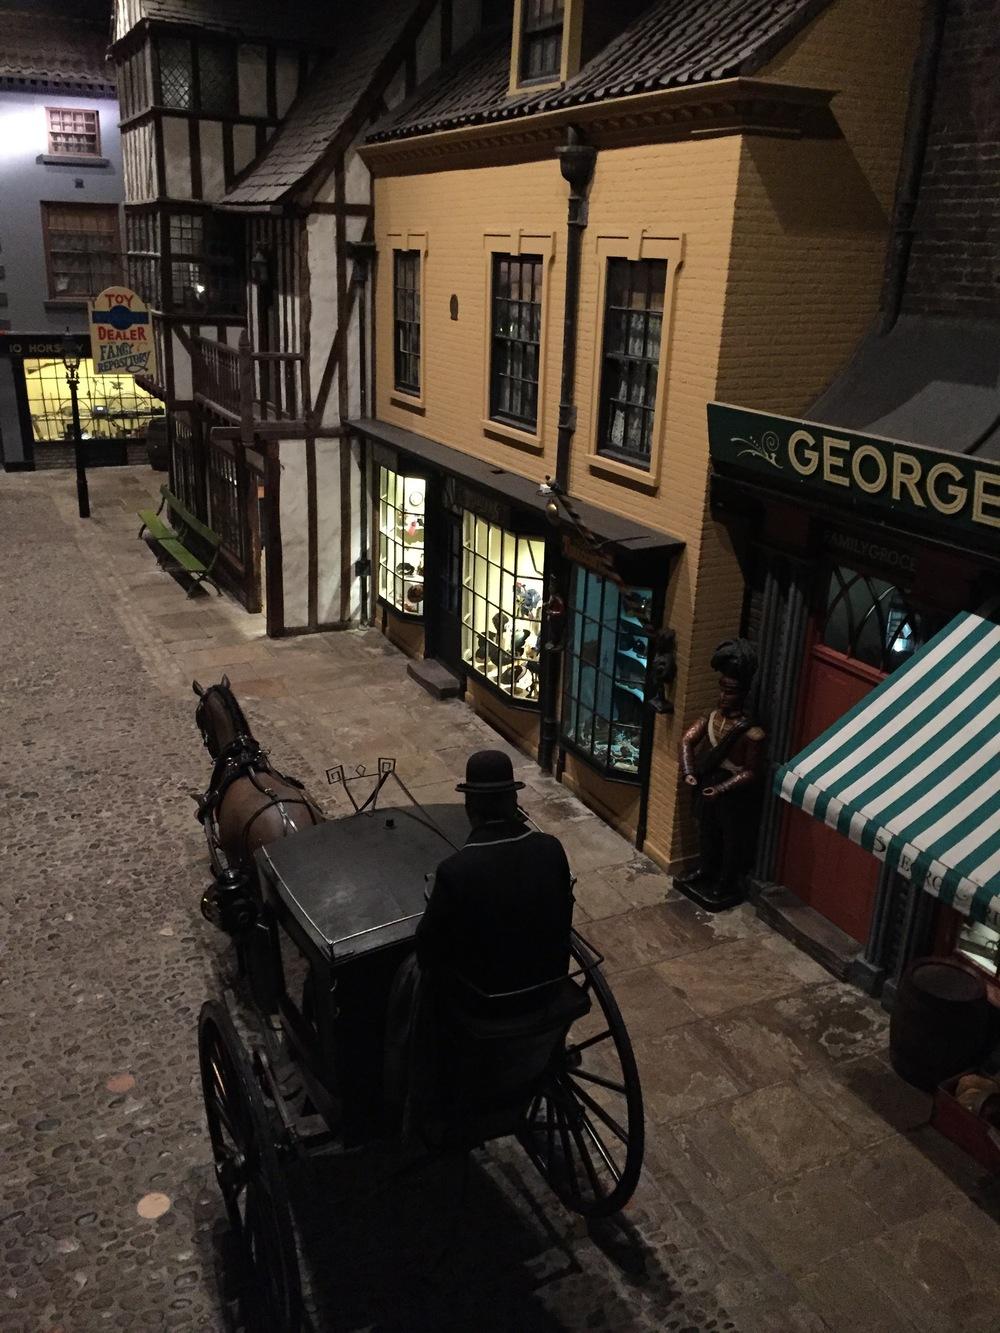 kirkgate-victorian-street-castle-museum-york